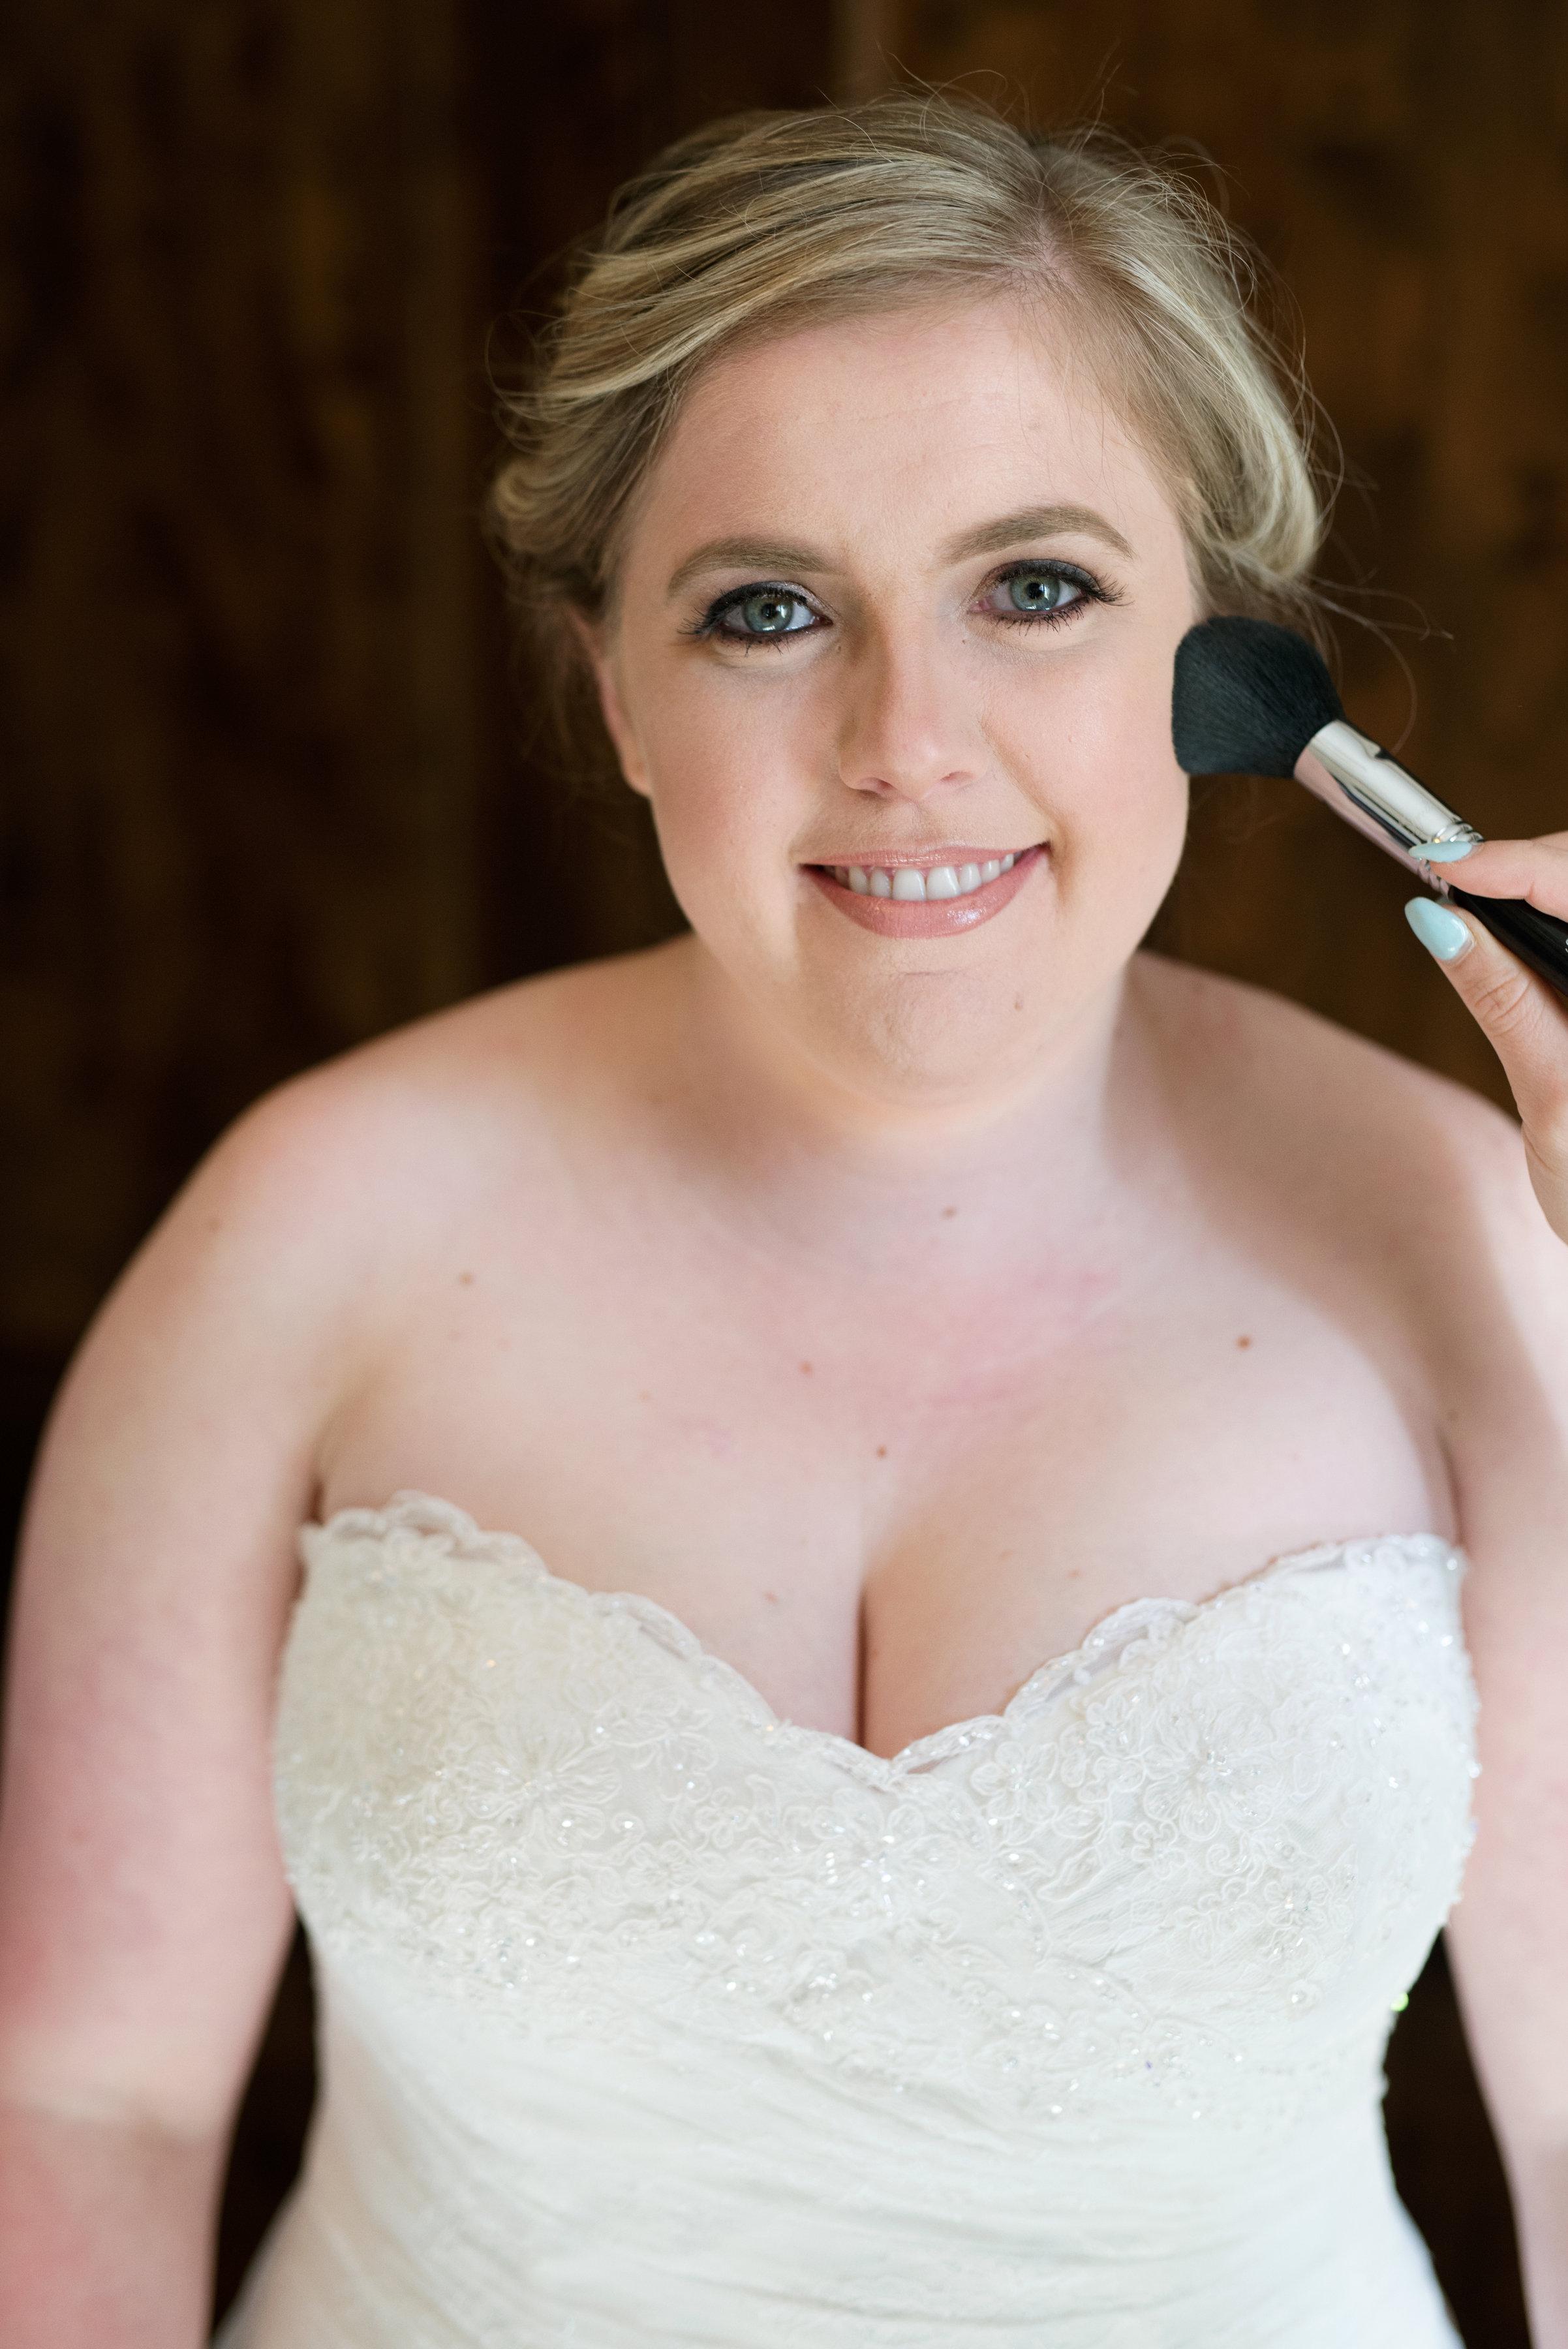 Ma Maison Austin Wedding Venue_ Austin Wedding Planner Heavenly Day Events _ Kristi Wright Austin Wedding Photographer20160306_0099.JPG